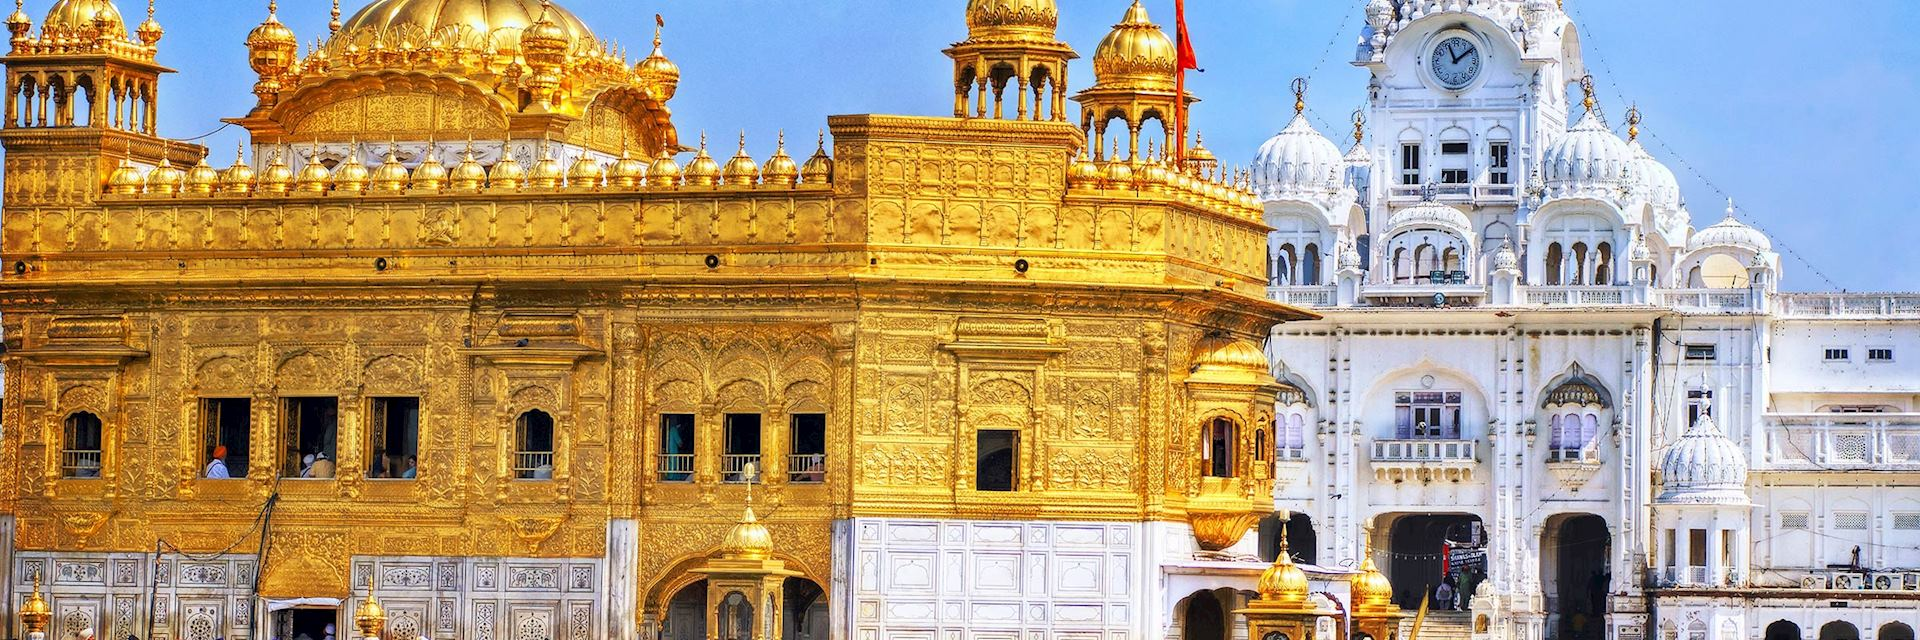 Amritsar's Golden Temple